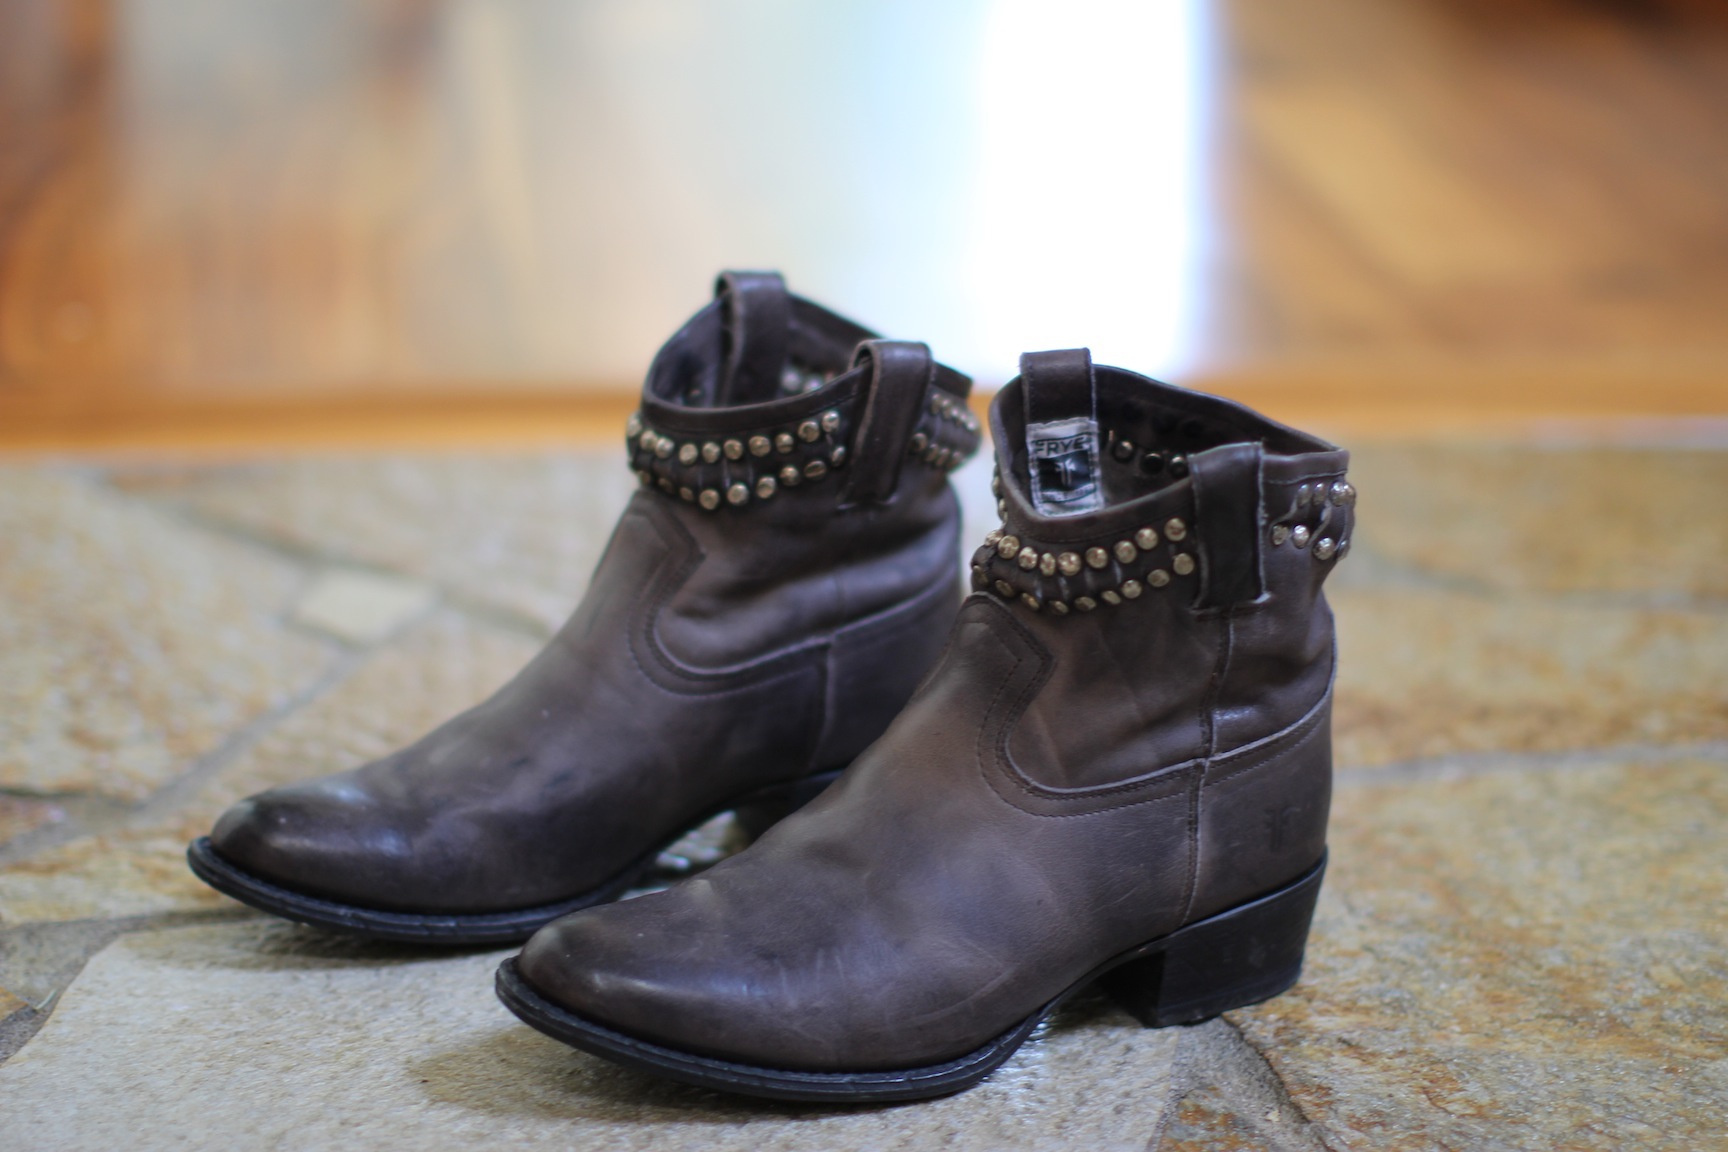 NYC Boots IMG_5535 web.jpeg